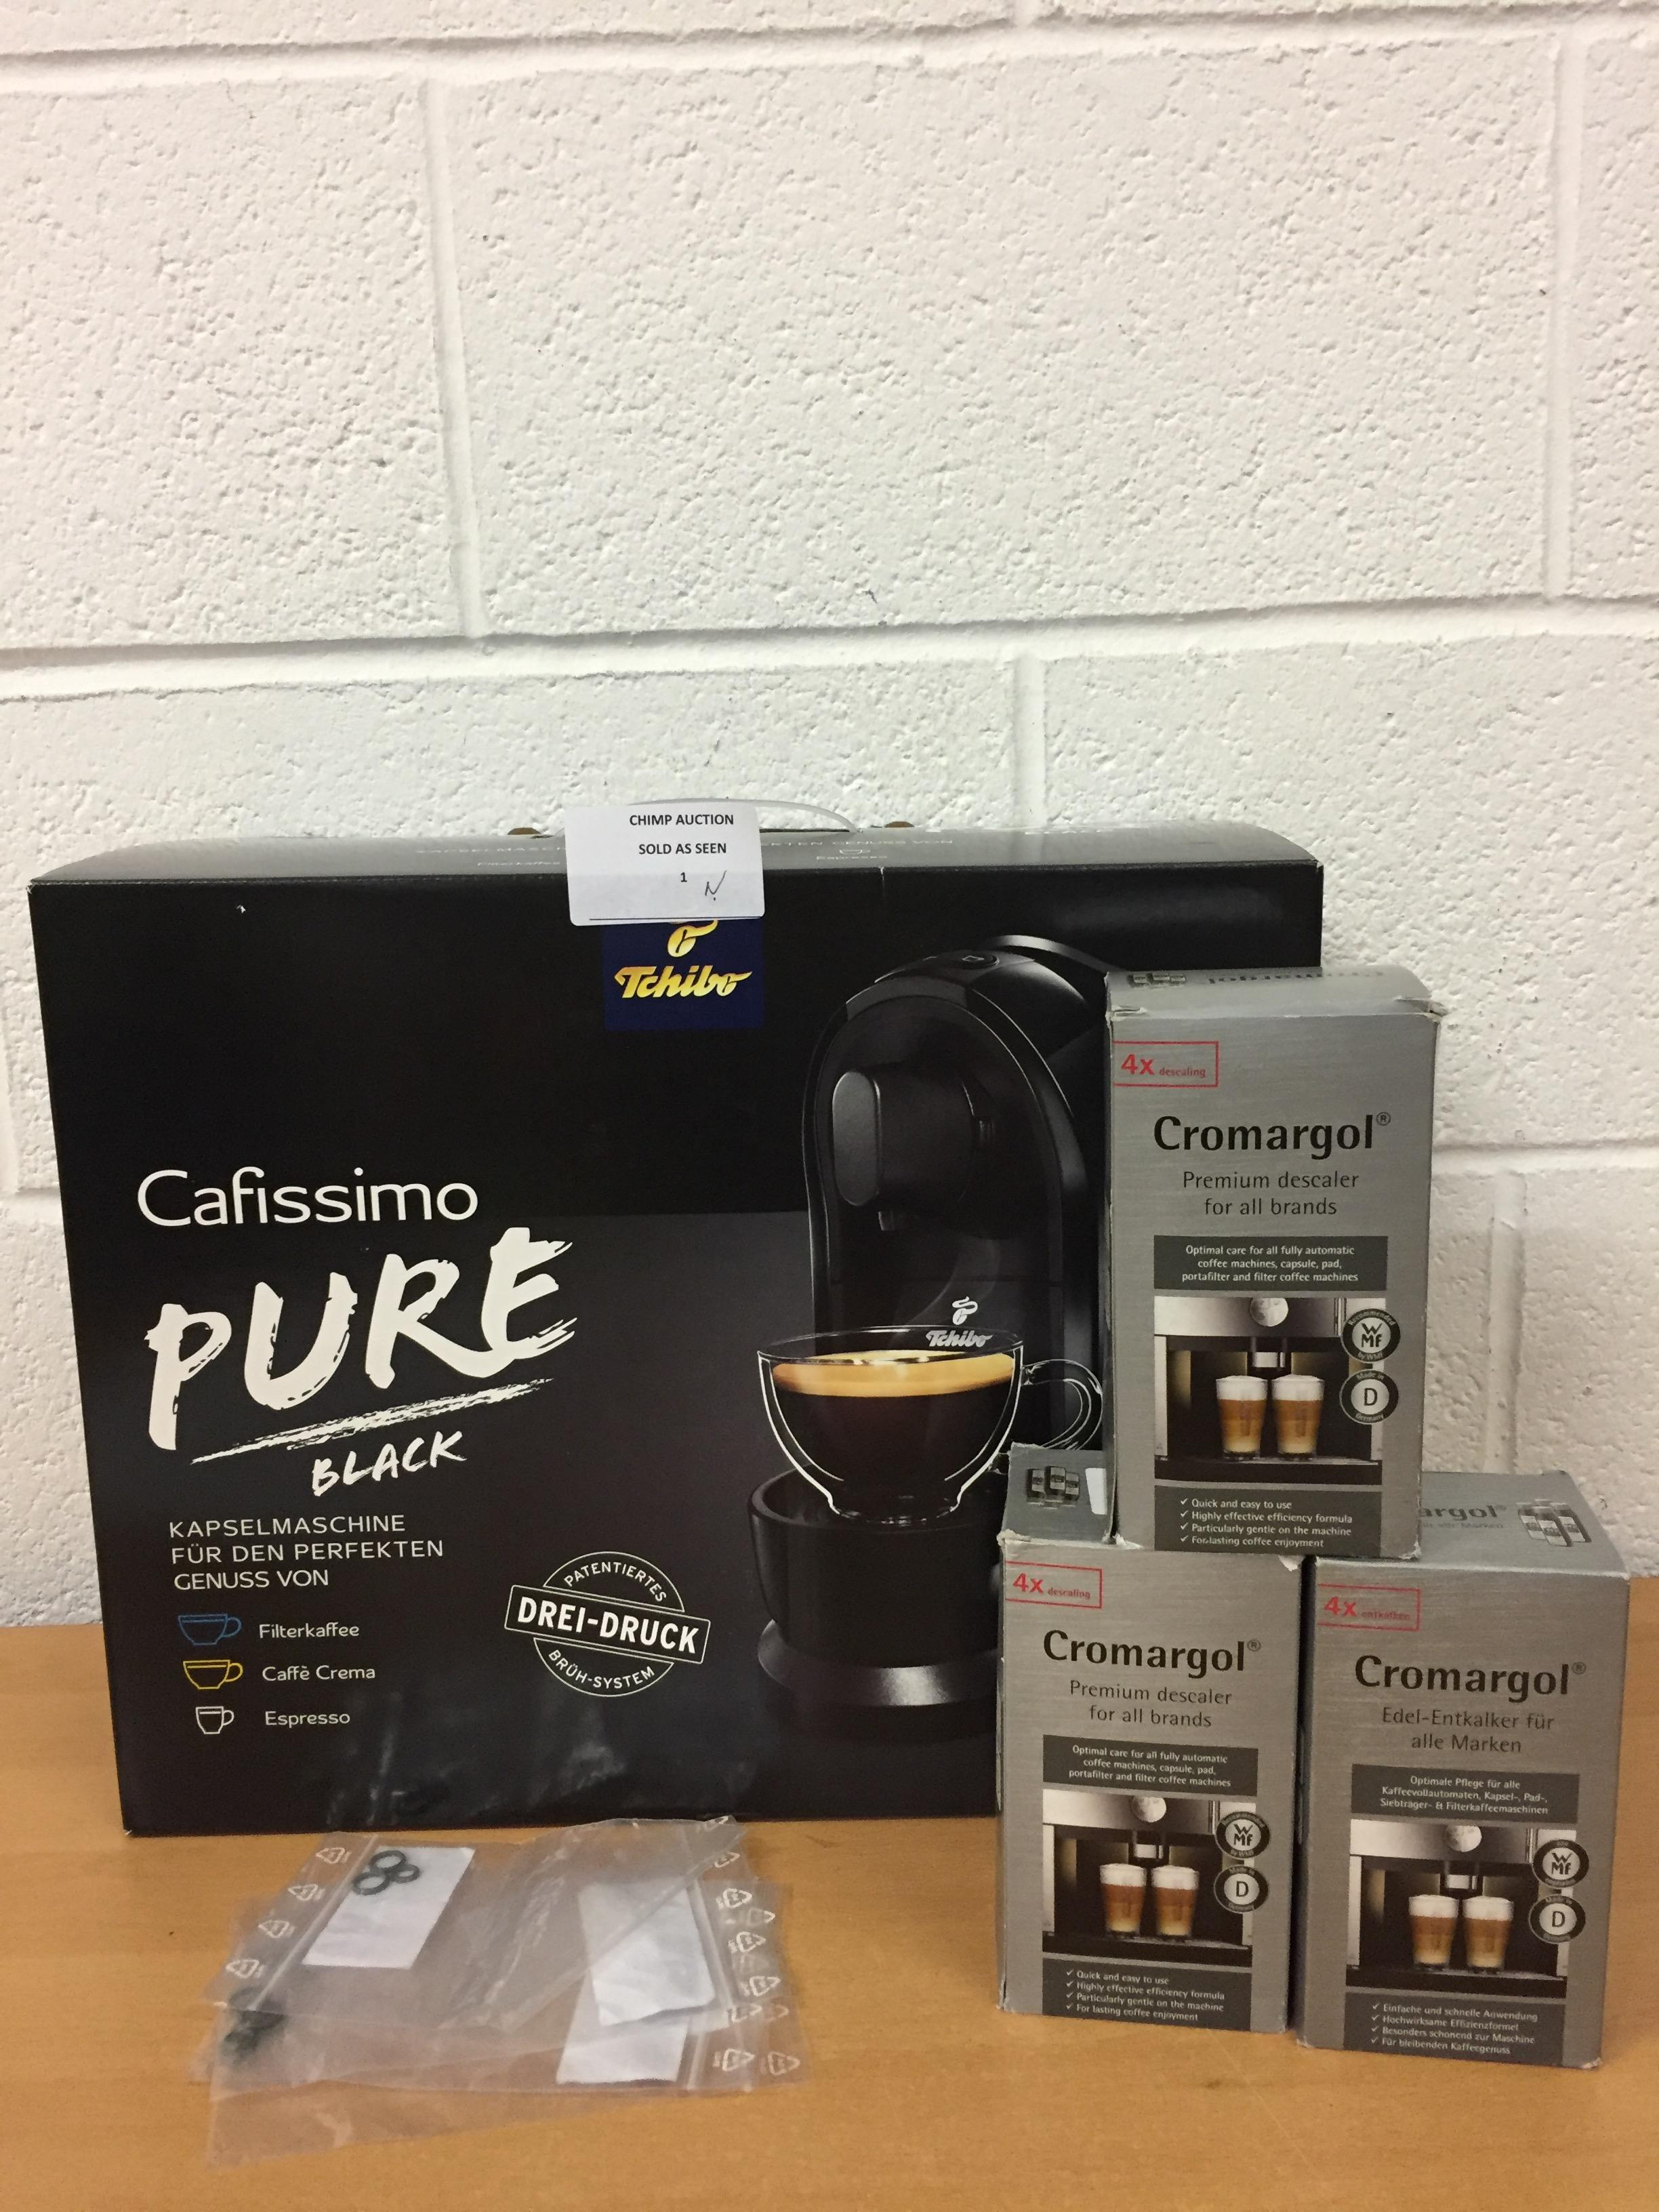 Lot 1 - Brand new Tchibo Cafissimo Pure Coffee Machine bundle RRP £229.99.